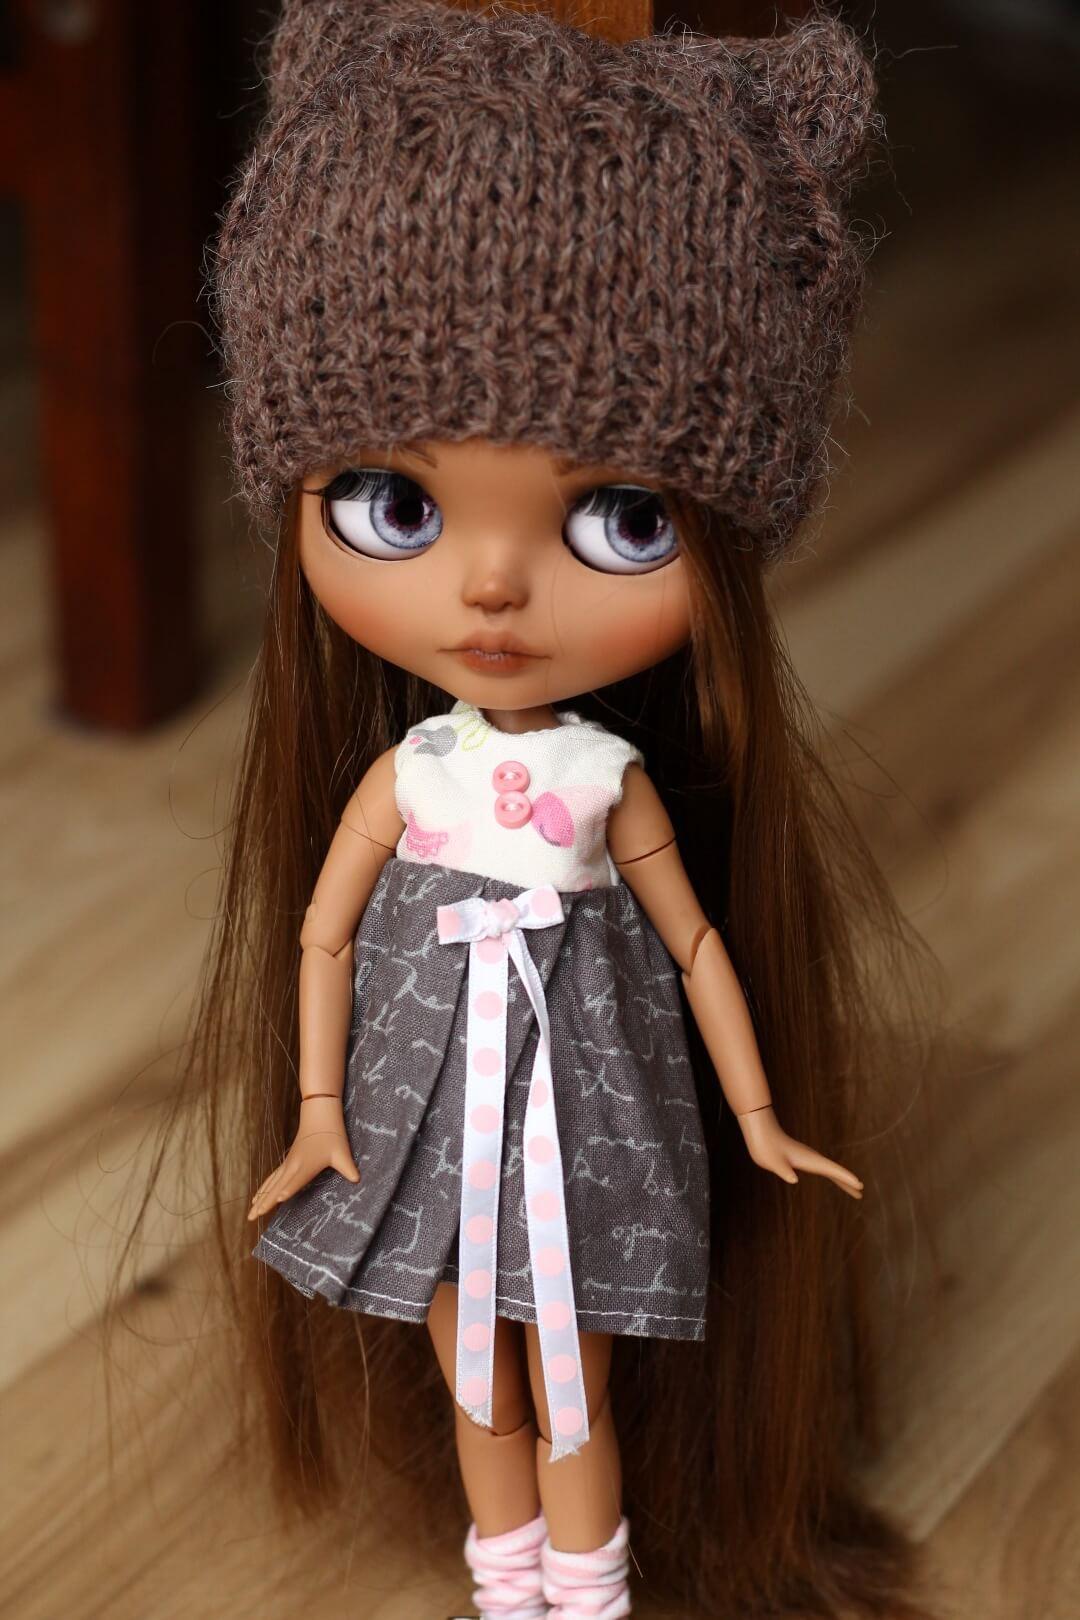 Custom Blythe Doll no 43 Hattie - 16